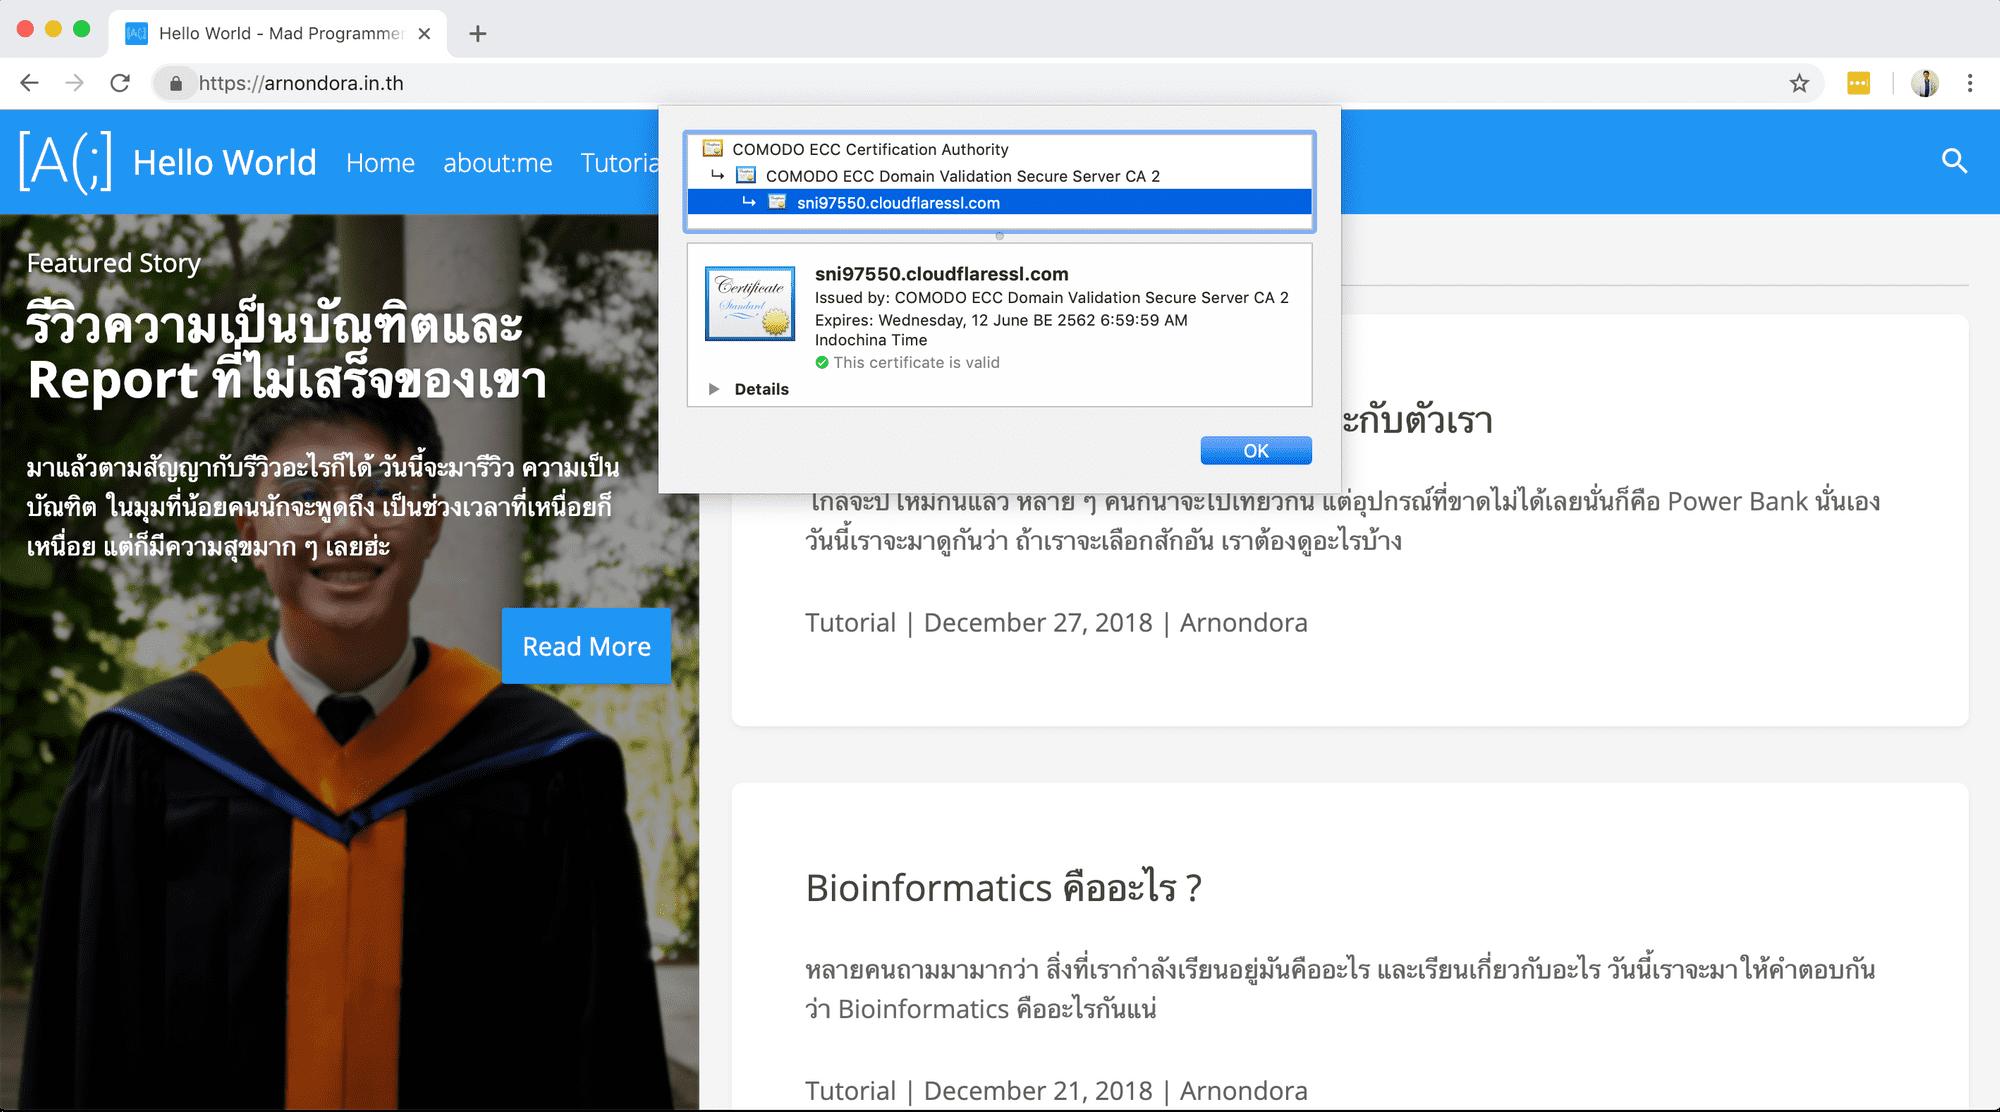 arnondora.in.th SSL Certificate Information